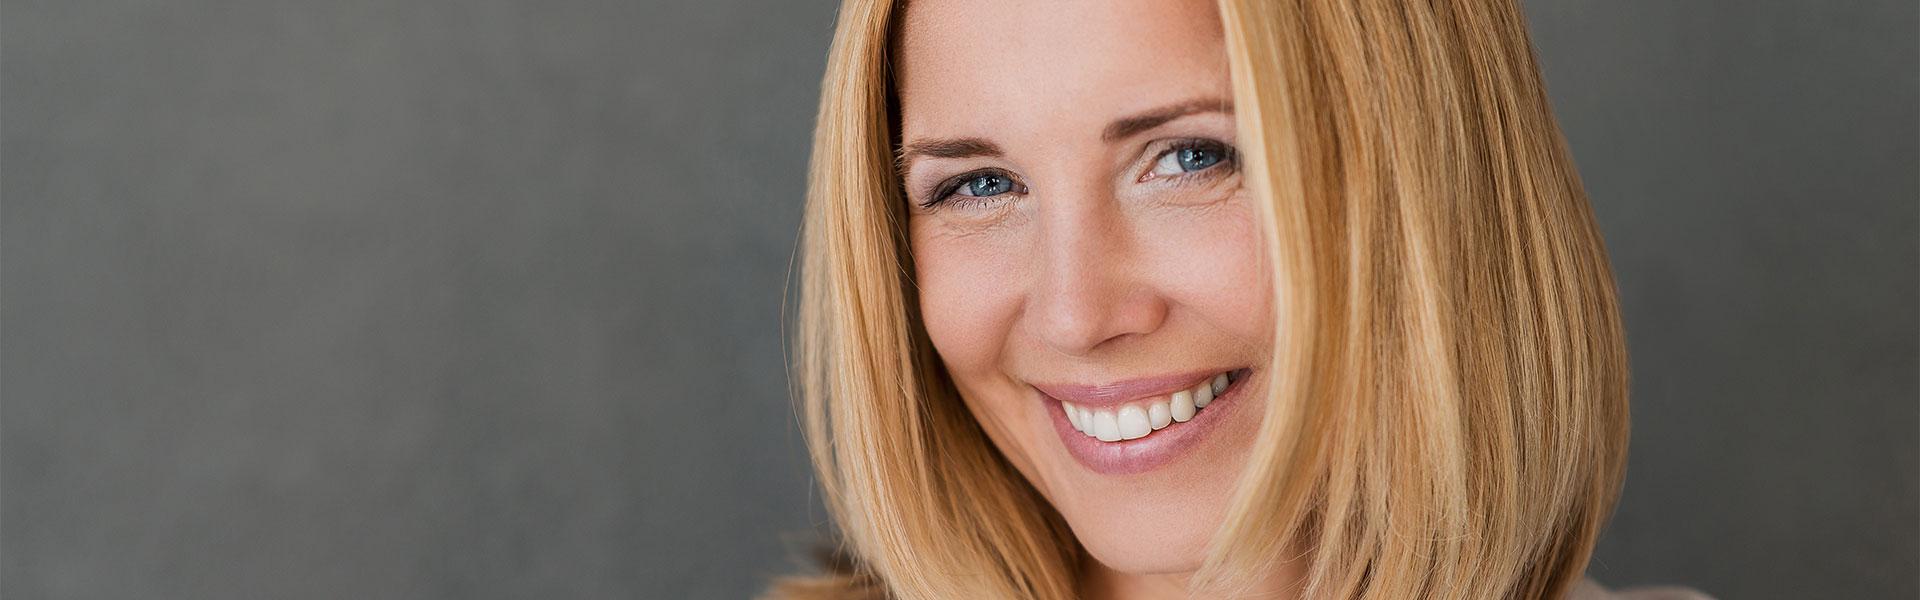 Woman smiling a confident smile